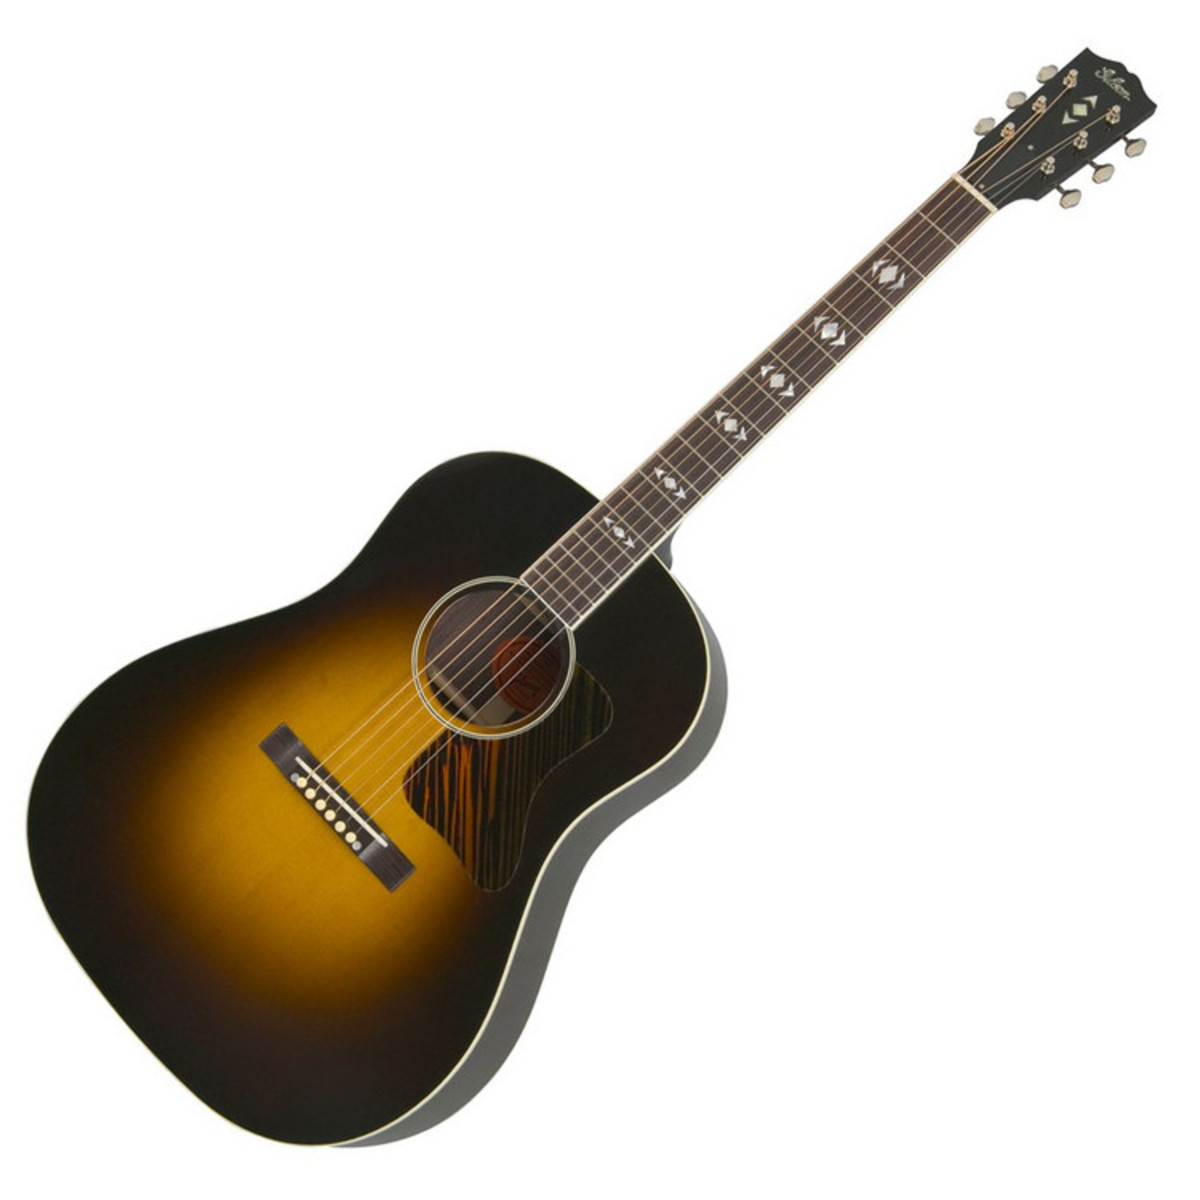 gibson advanced jumbo vintage sunburst acoustic guitar at. Black Bedroom Furniture Sets. Home Design Ideas